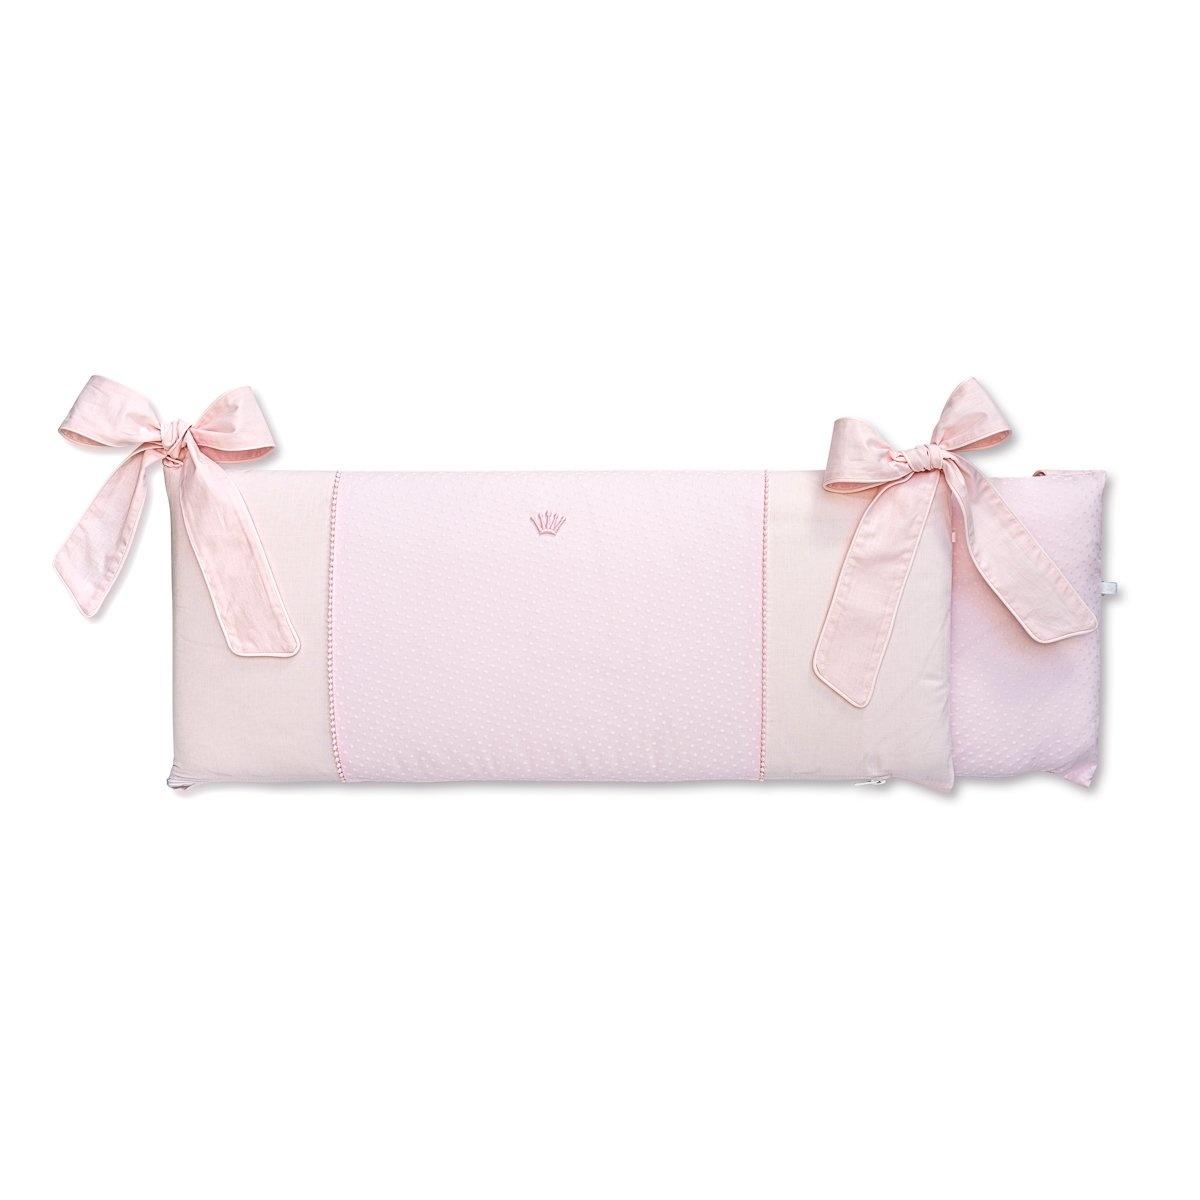 Bedomranding  60cm First  Pretty pink-1